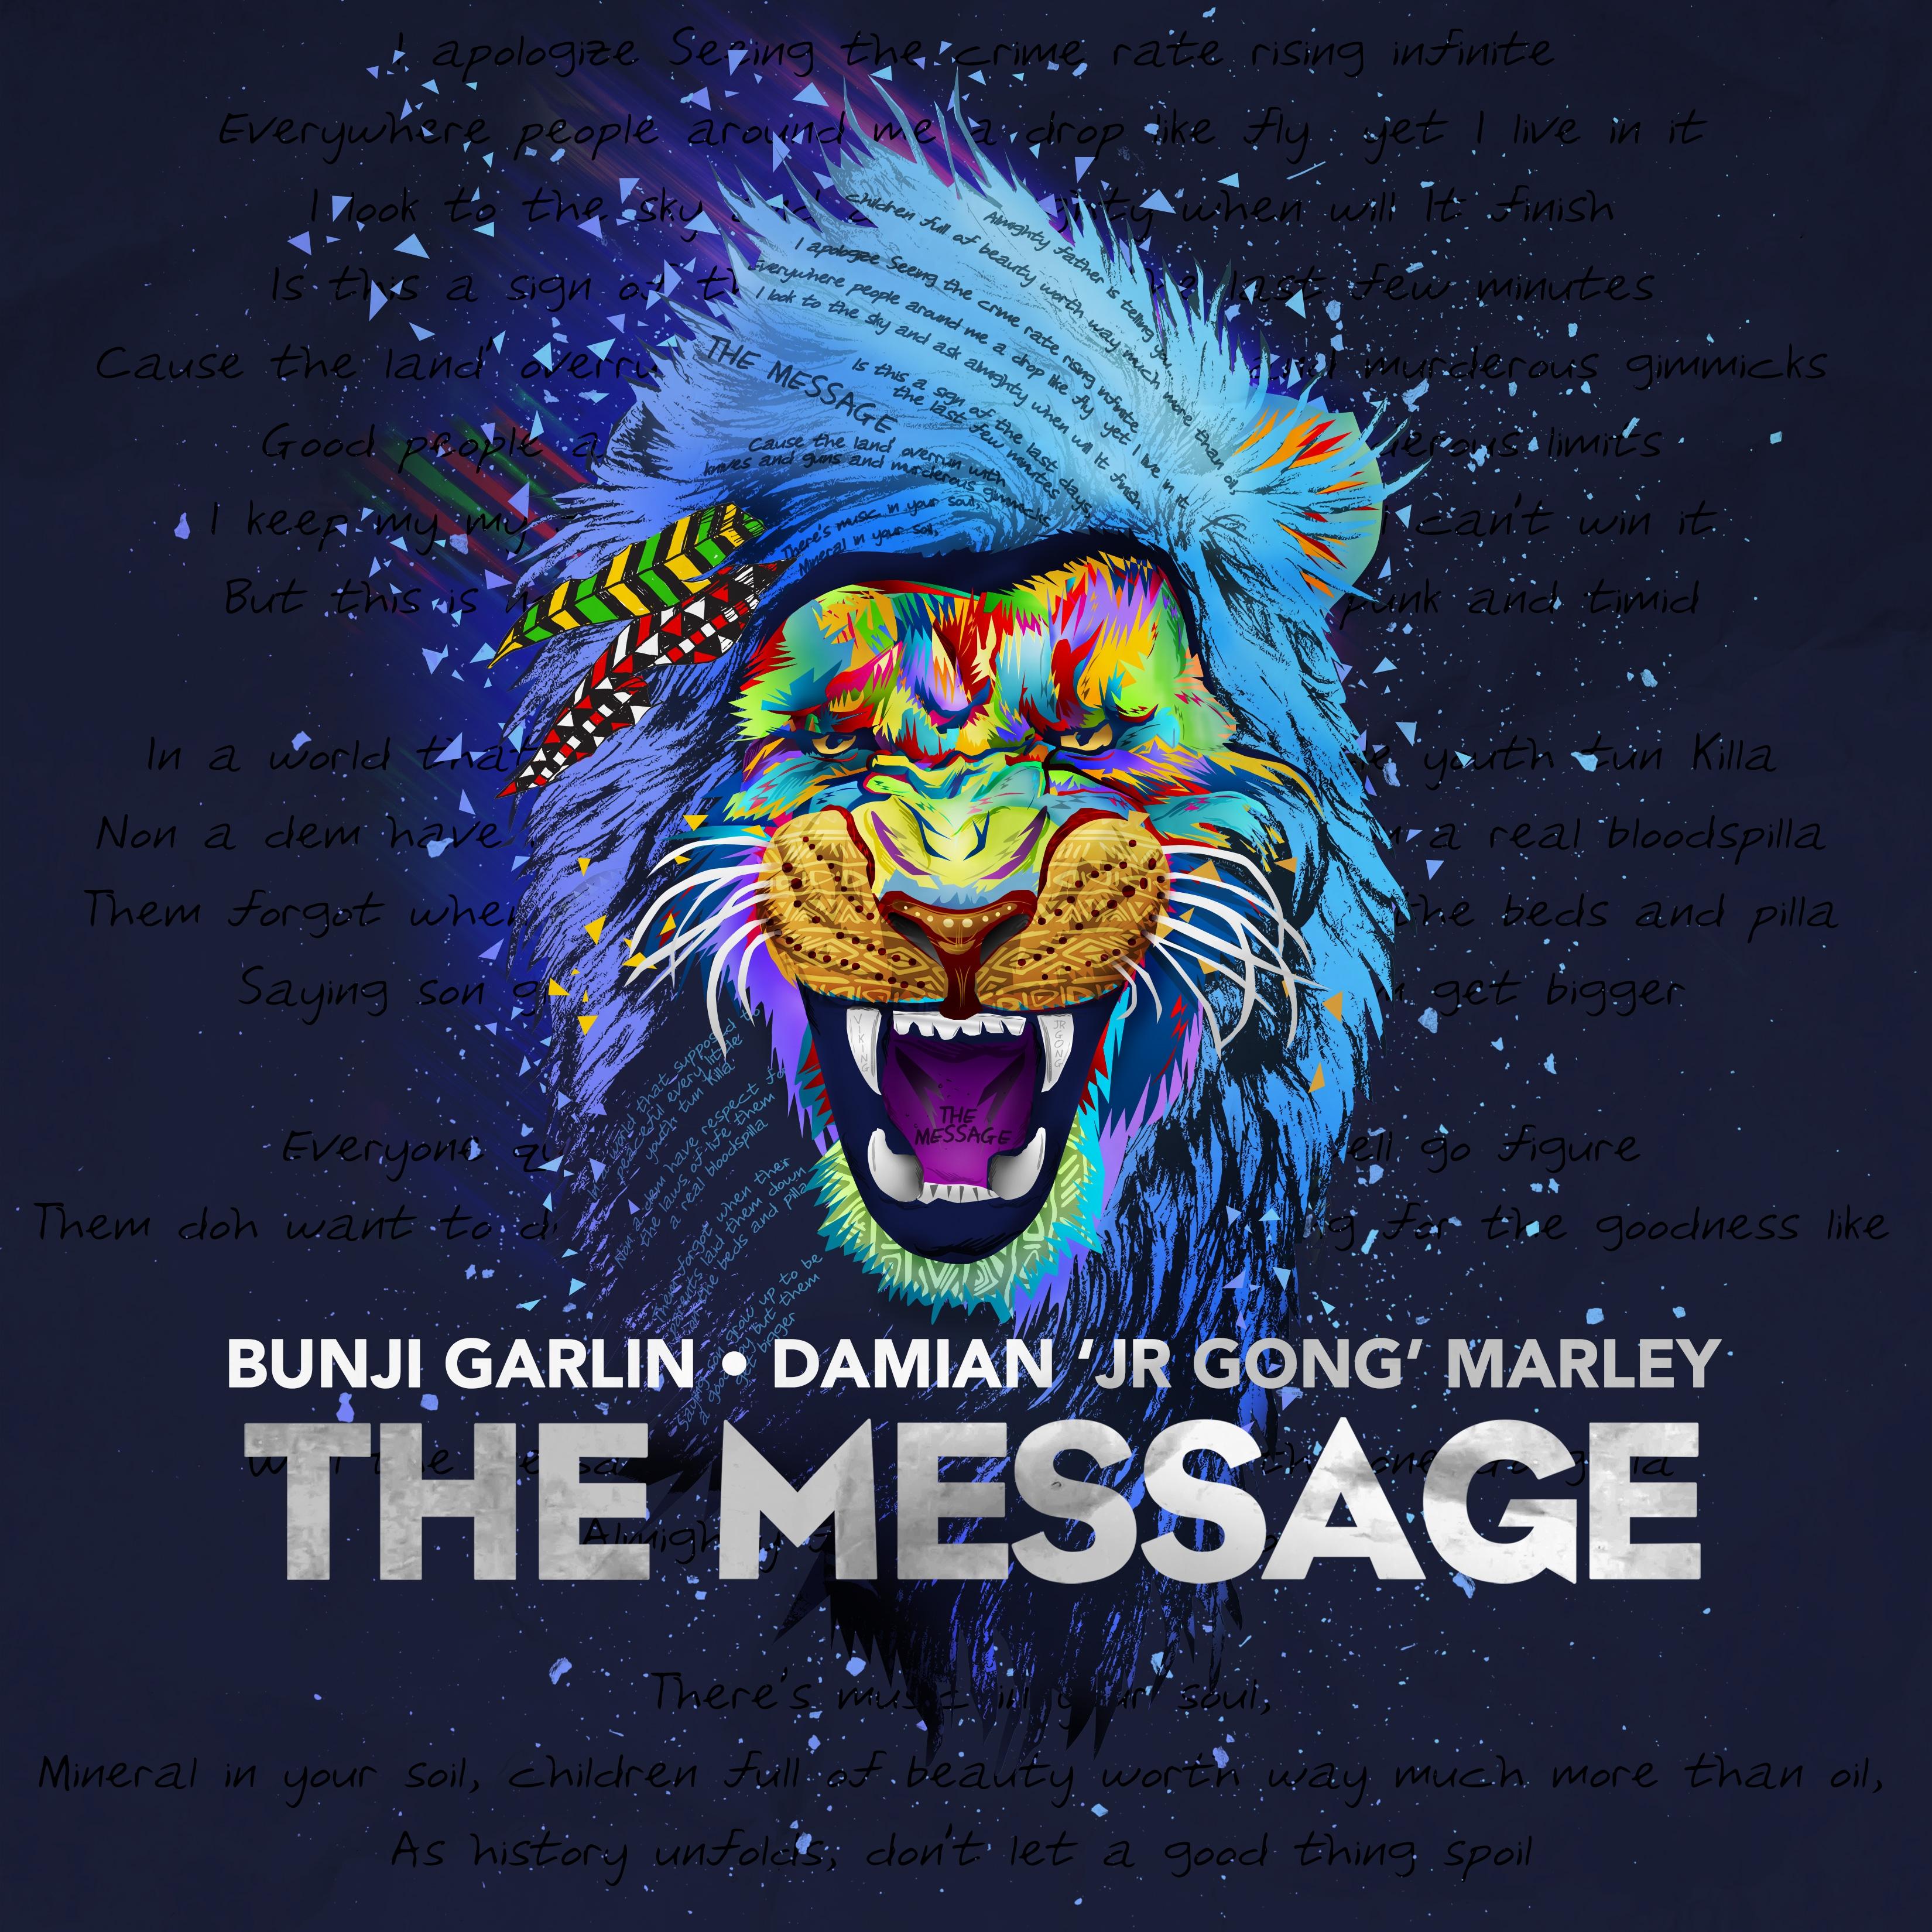 Bunji Garlin ft Damian Marley - The Message - Artwork